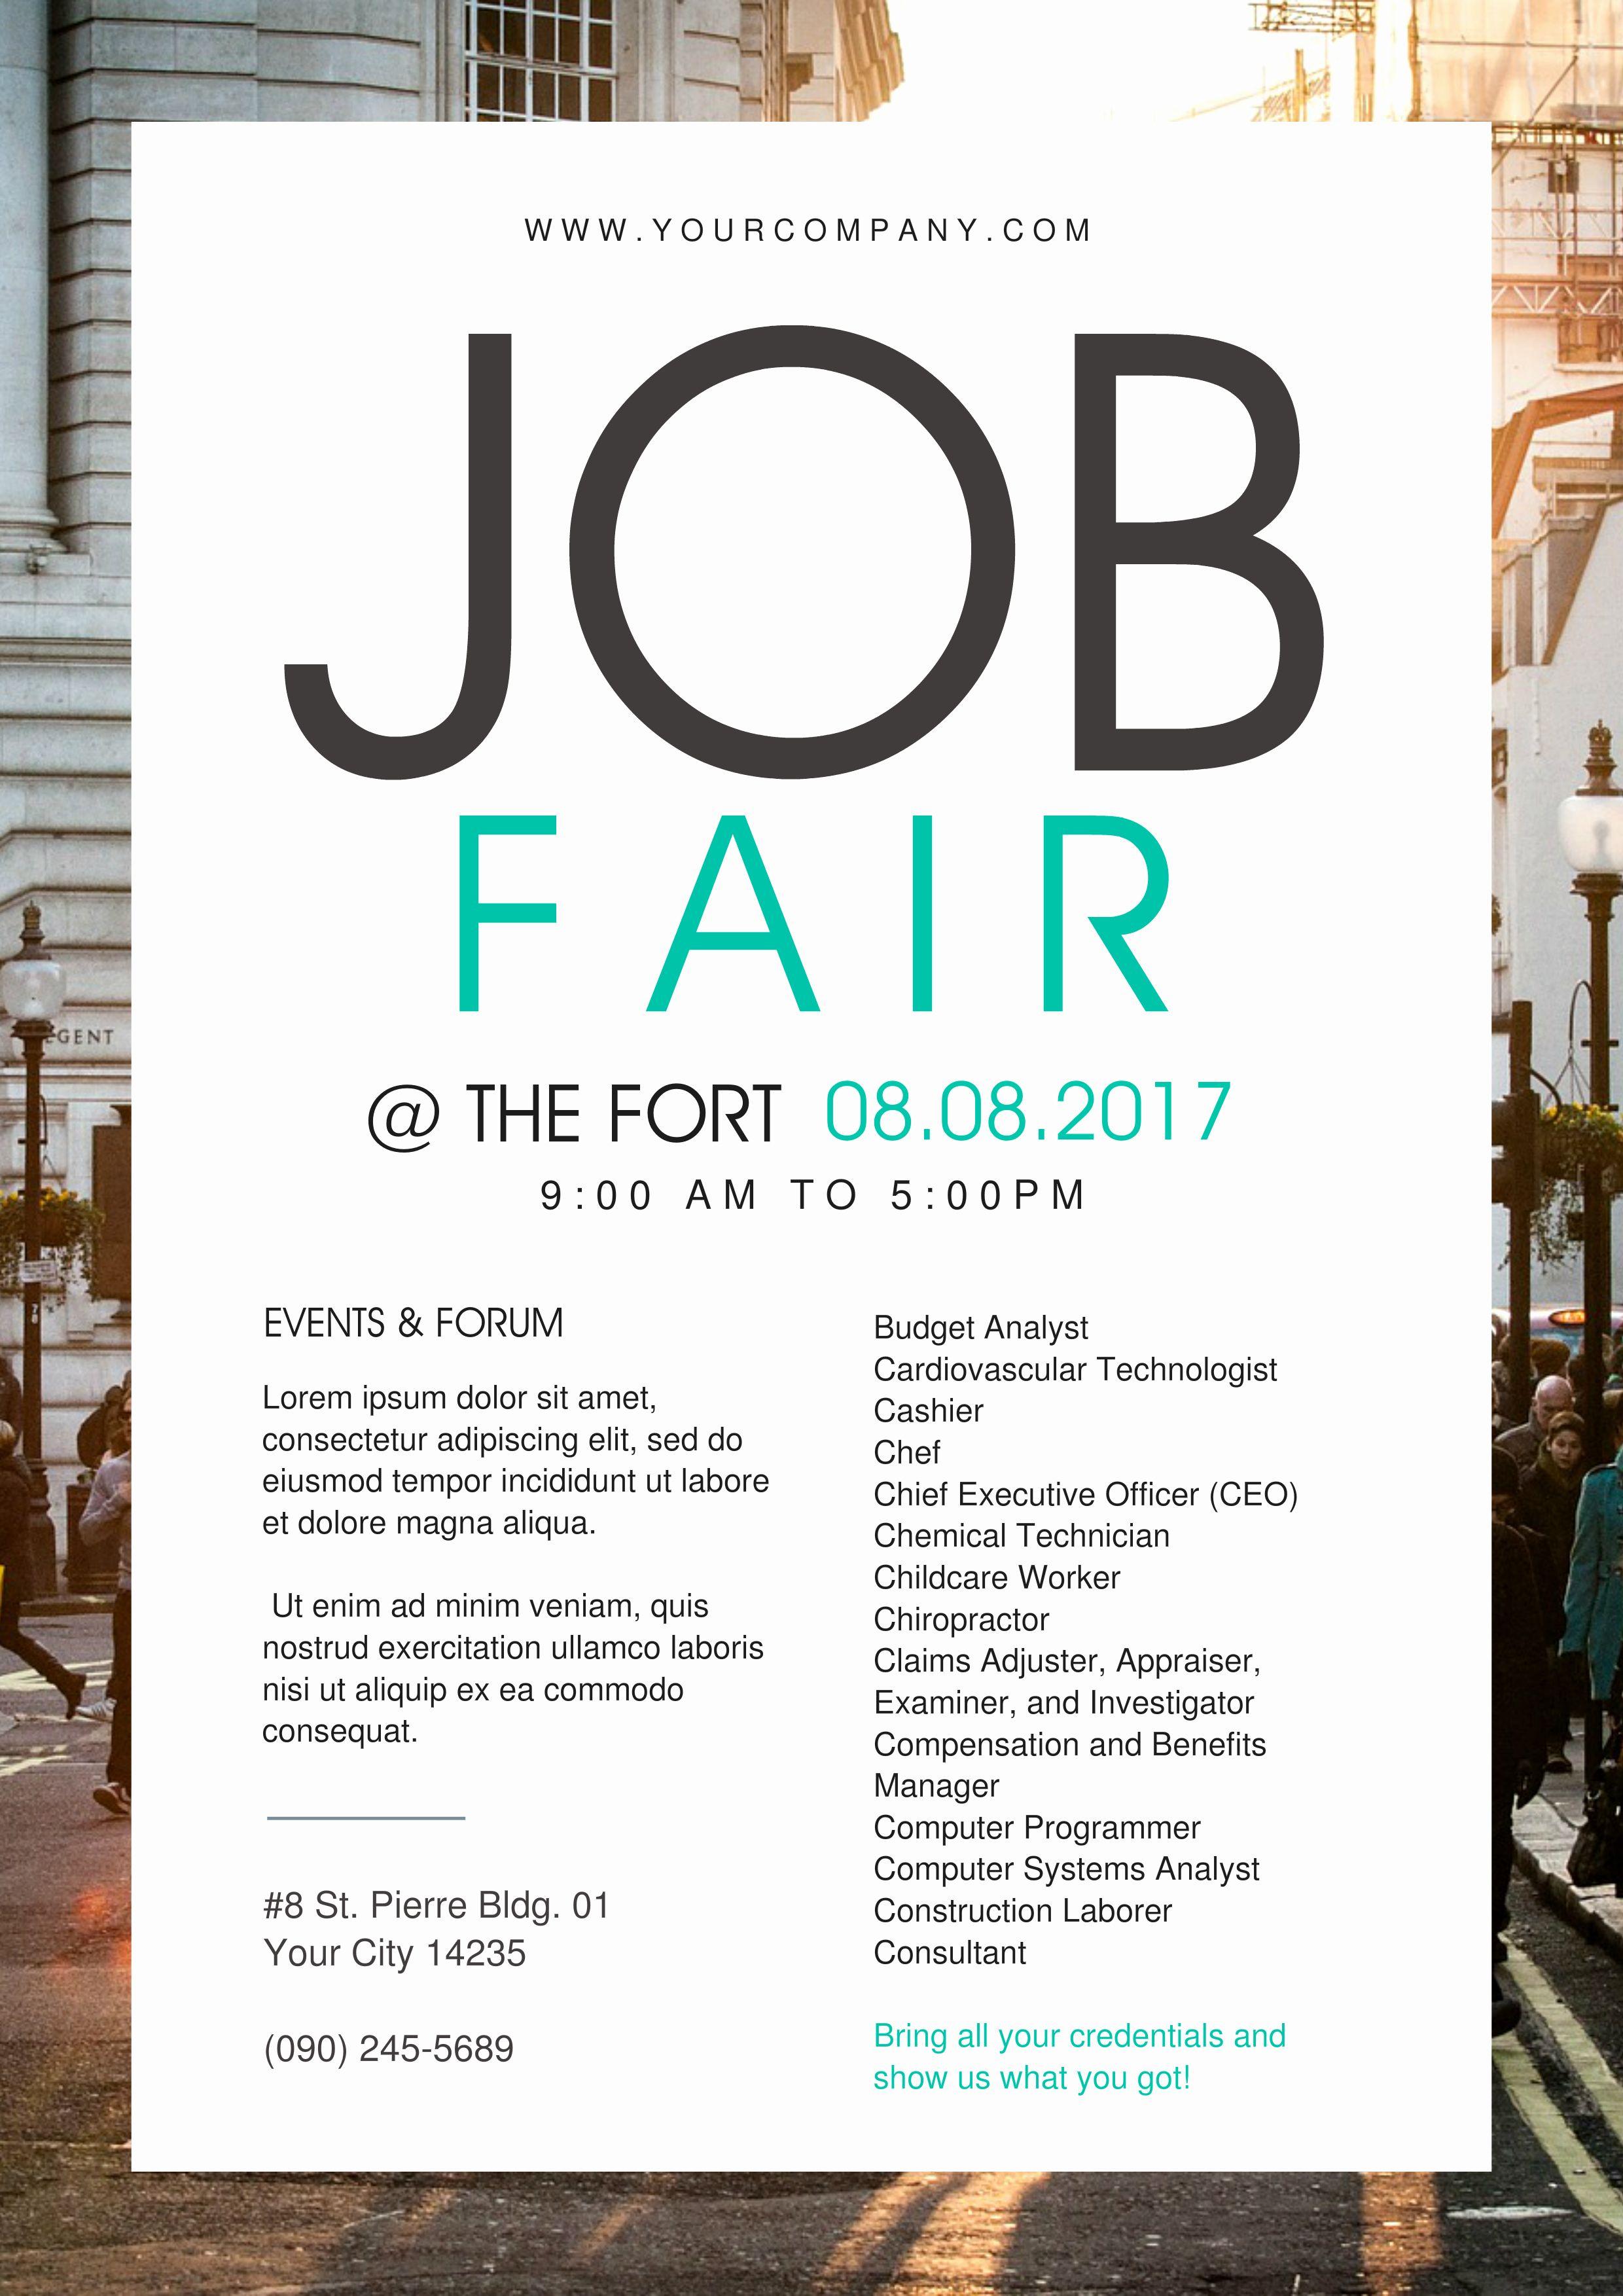 Job flyer template word in 2020 job fair flyer template